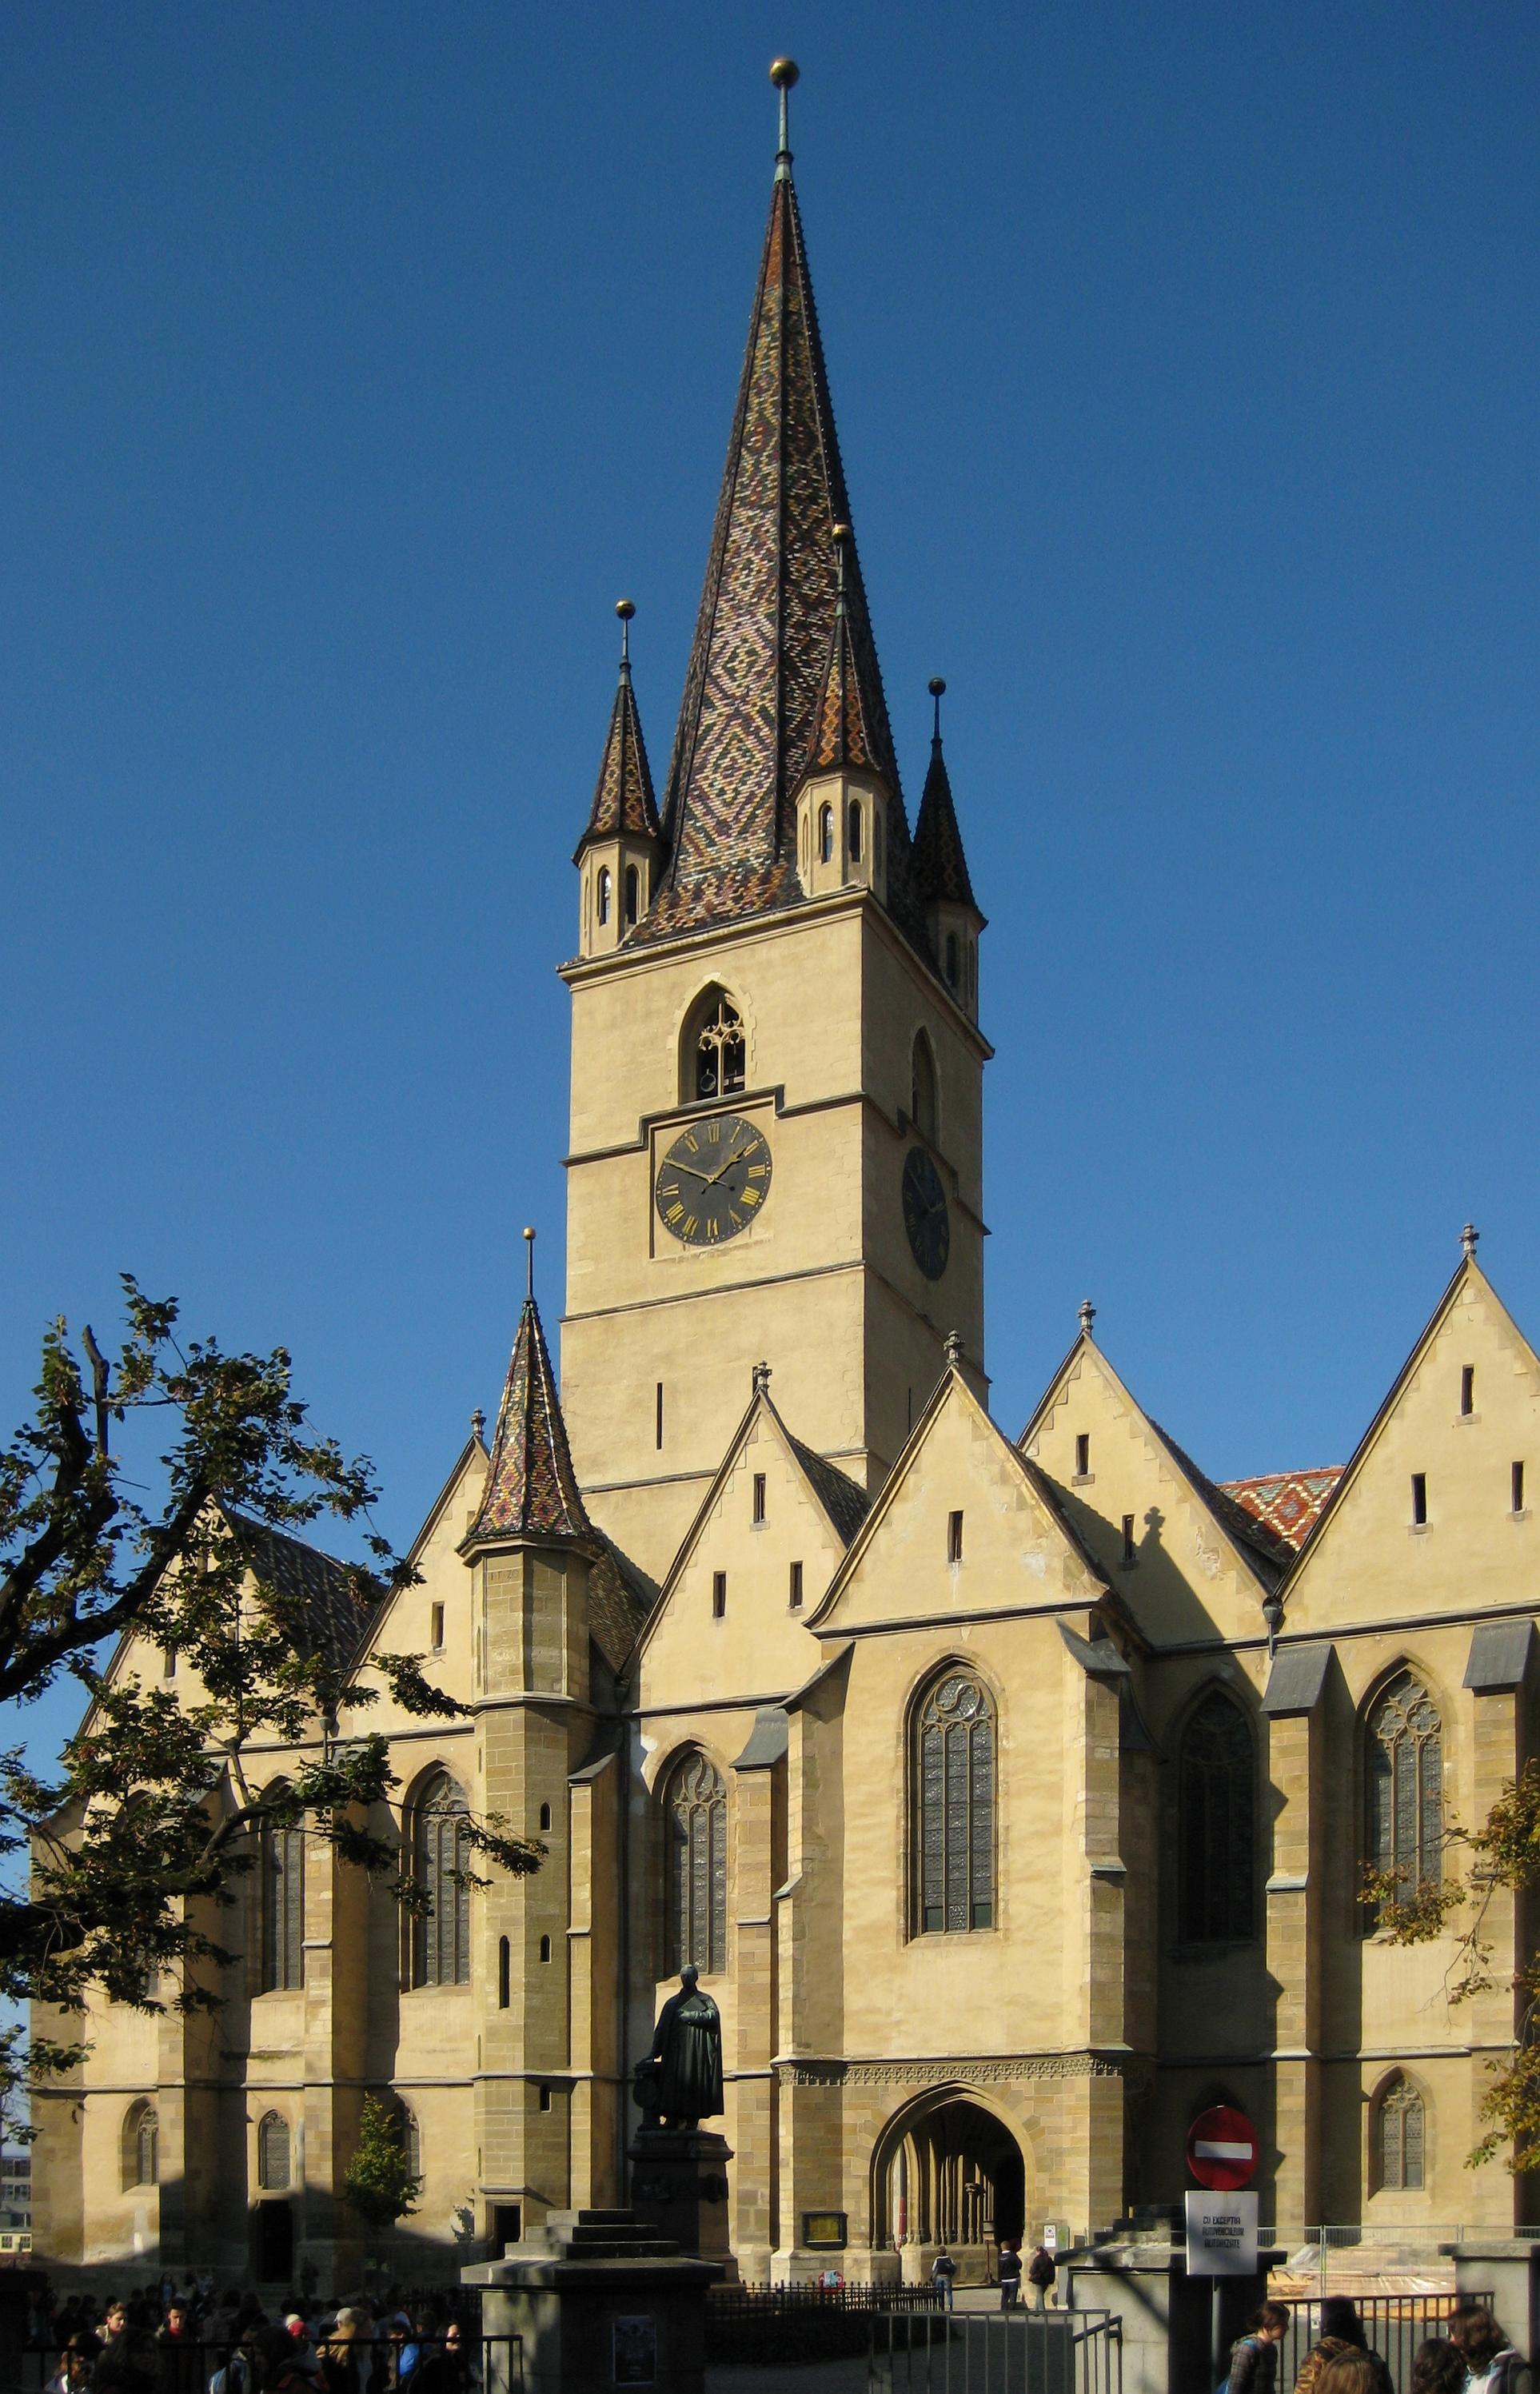 File:Sibiu (Hermannstadt, Nagyszeben) - City Hall.jpg ...  |Hermannstadt